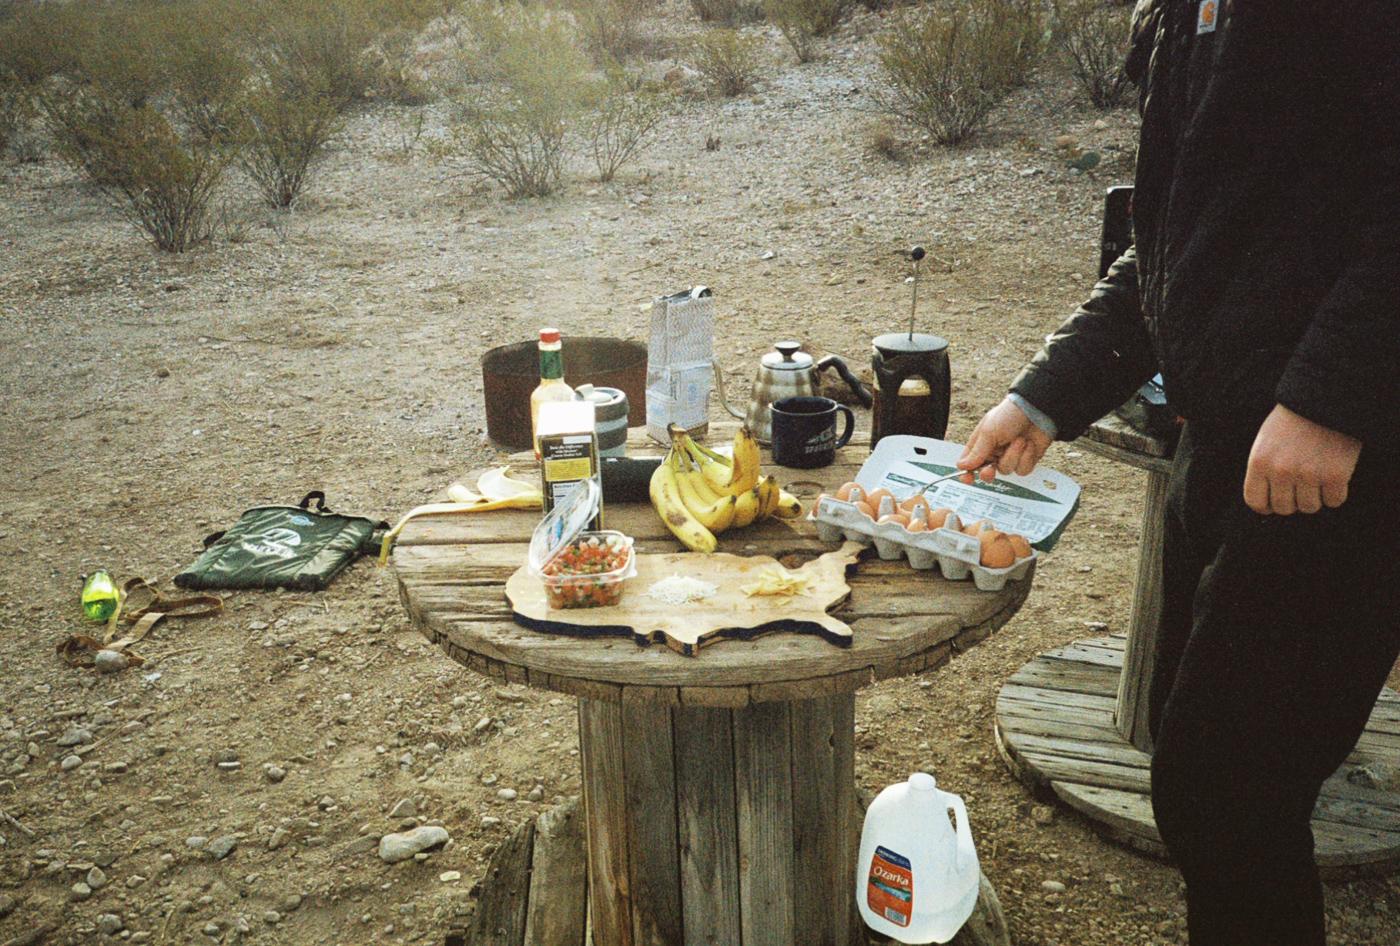 film 35mm lomo olympus hike camp big bend texas america yall pawlowski breakfast